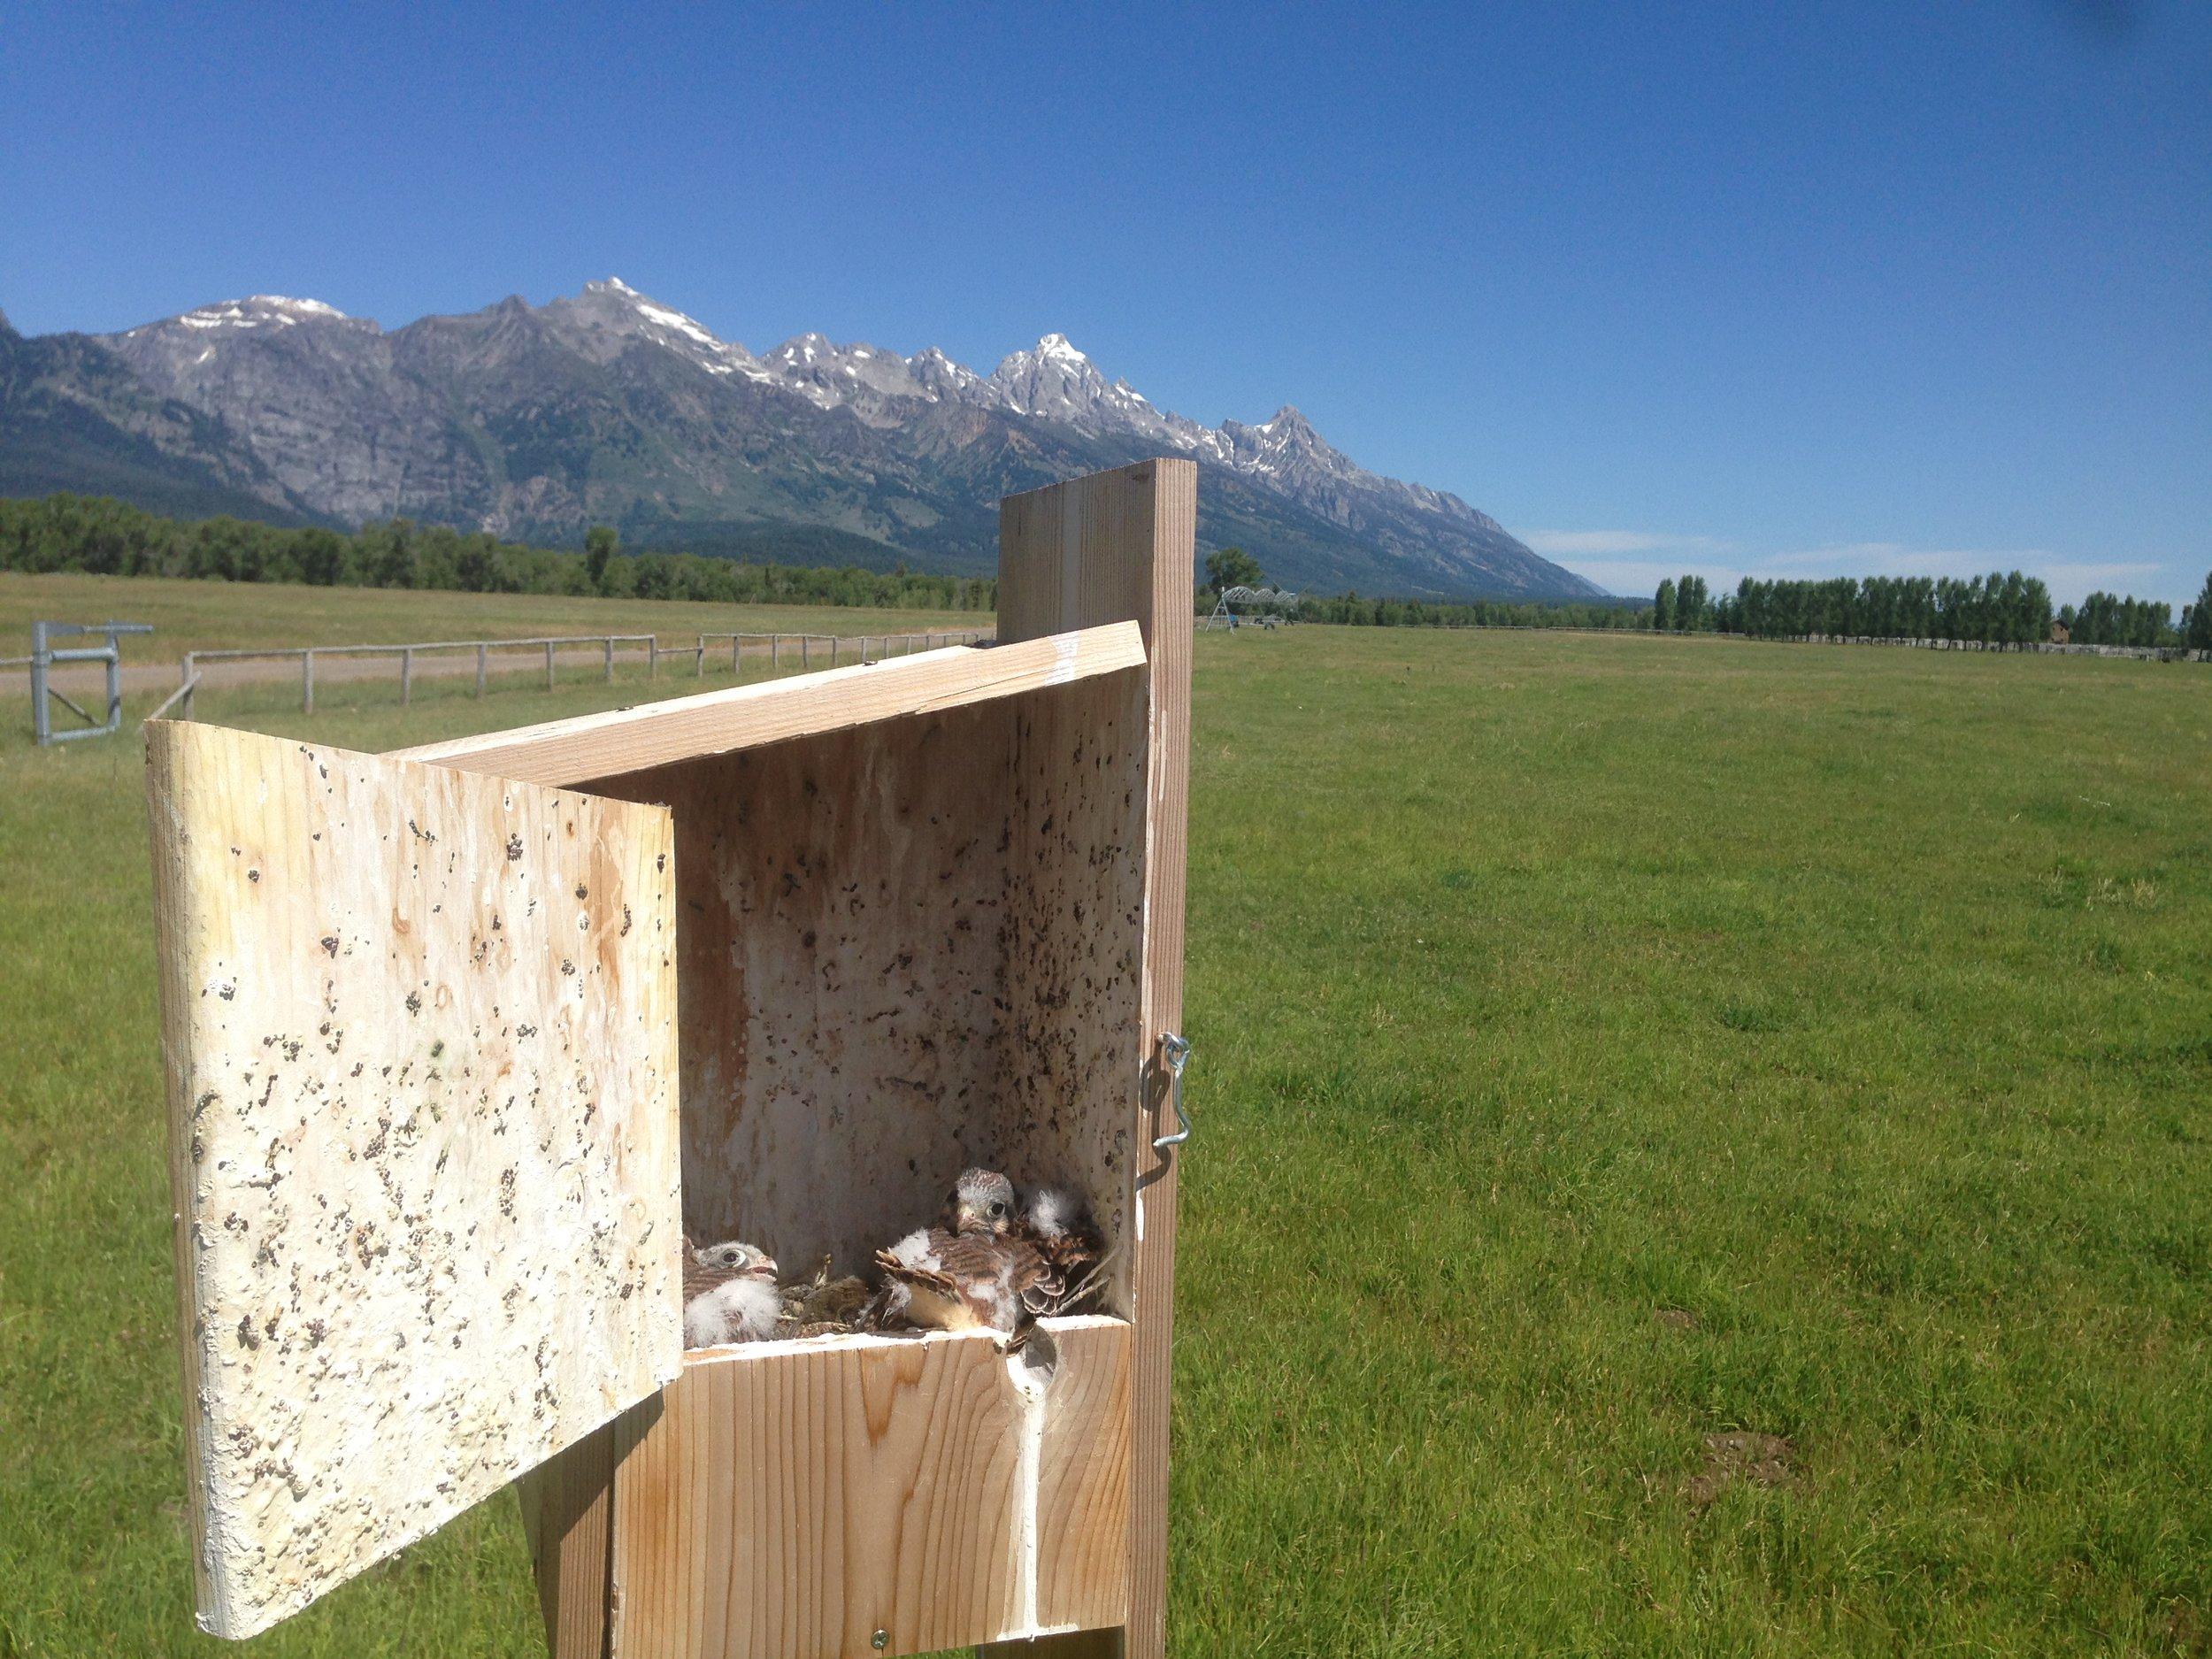 American kestrel fledglings in assembled bird box.